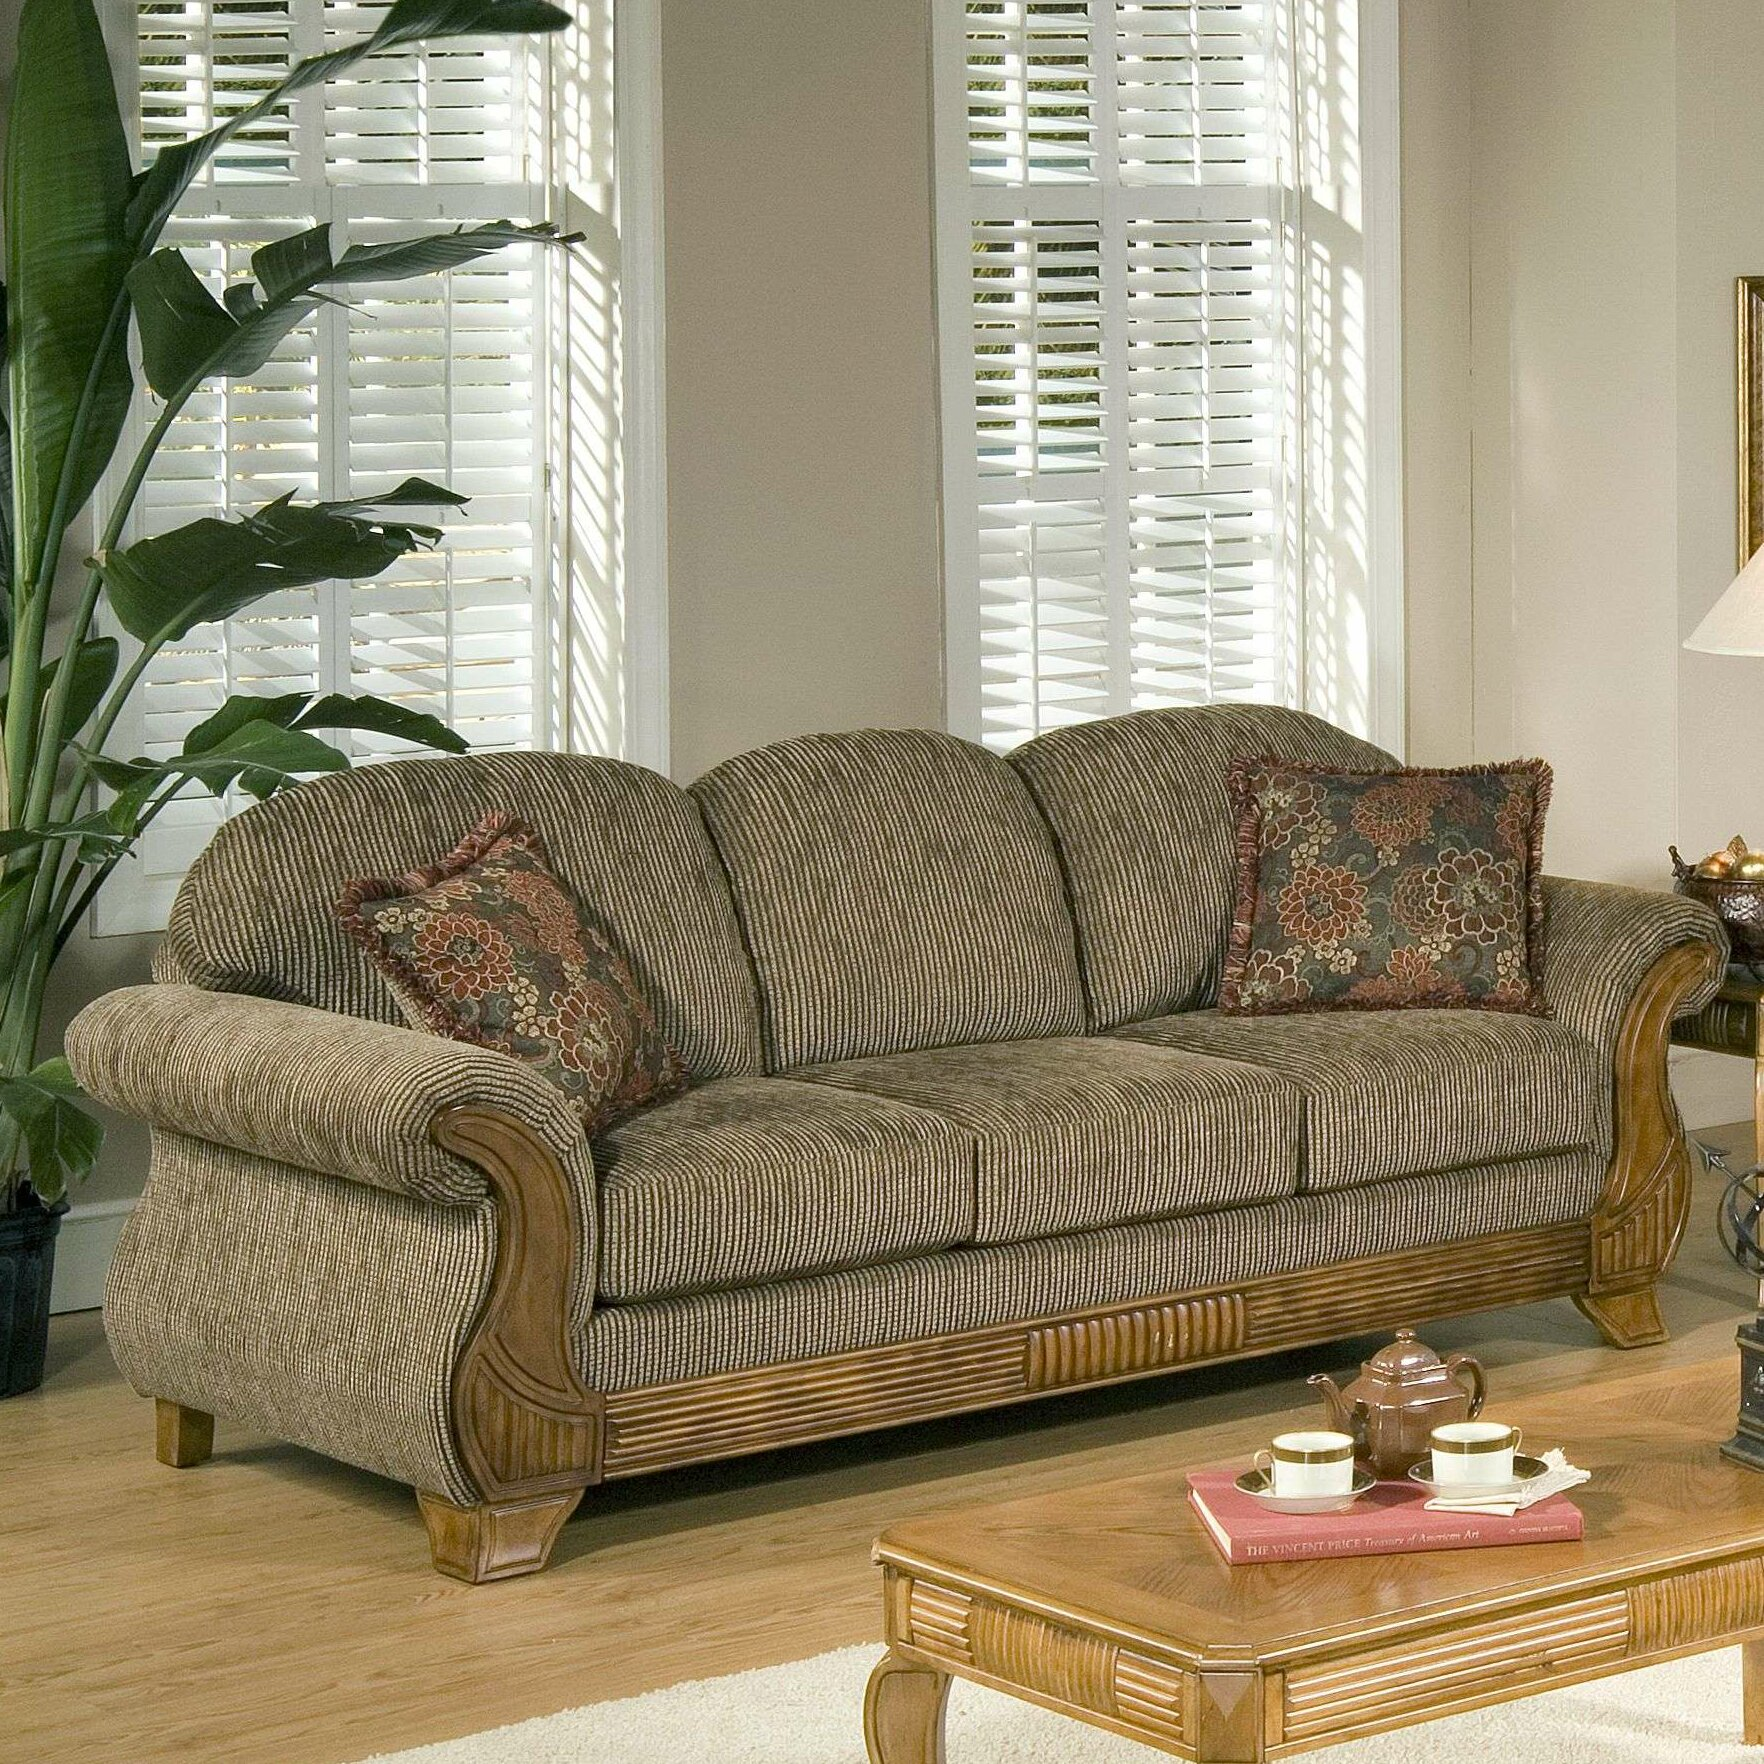 Serta Living Room Furniture Astoria Grand Serta Upholstery Moncalieri Sofa Reviews Wayfair